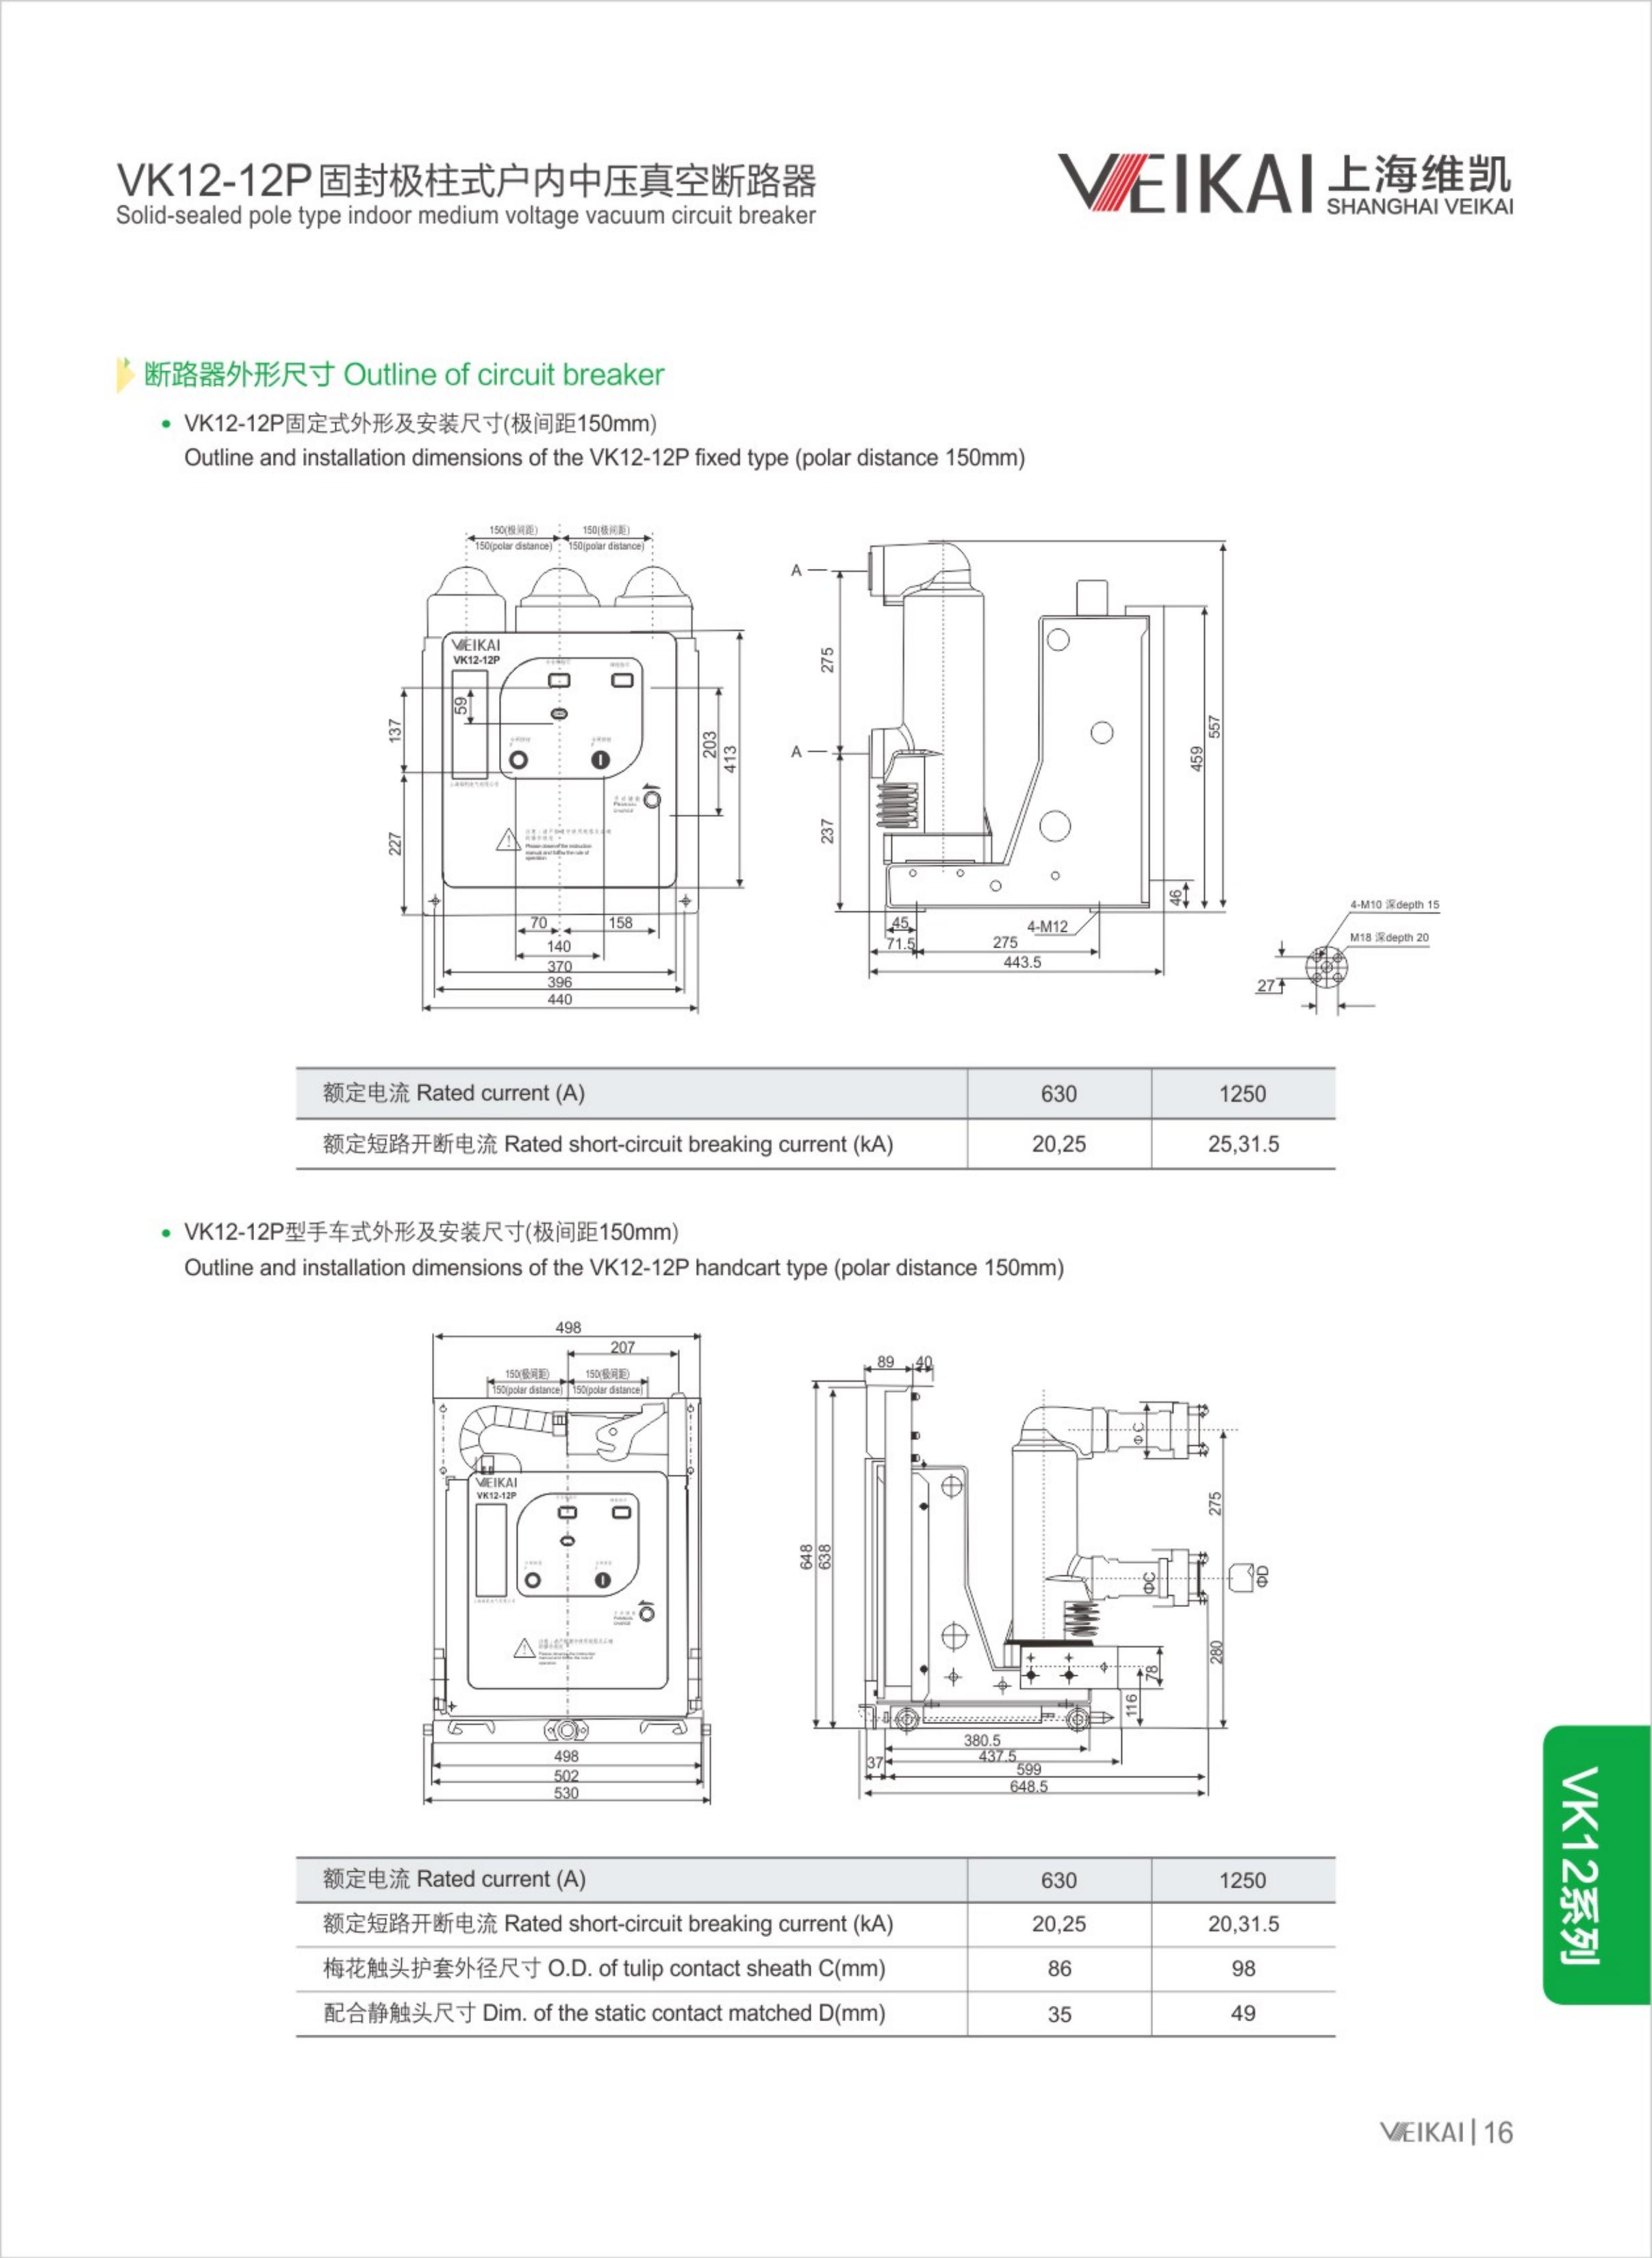 VK12系列产品选型手册_20.png